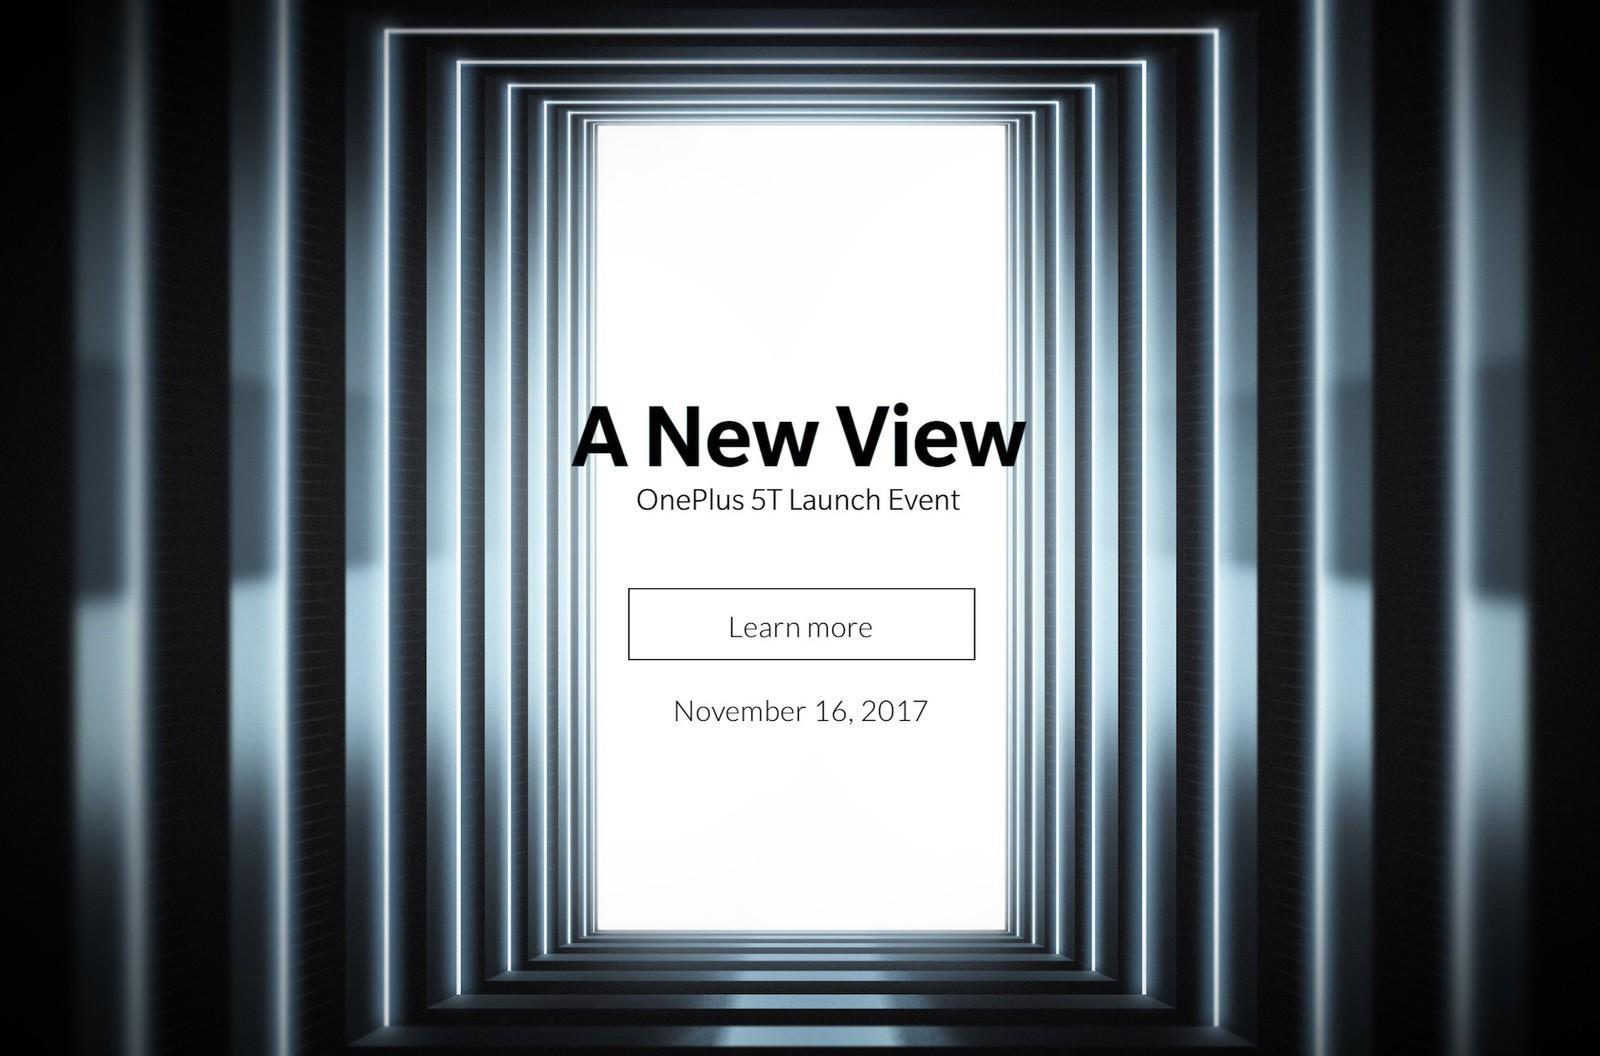 cartel de presentación OnePlus 5T